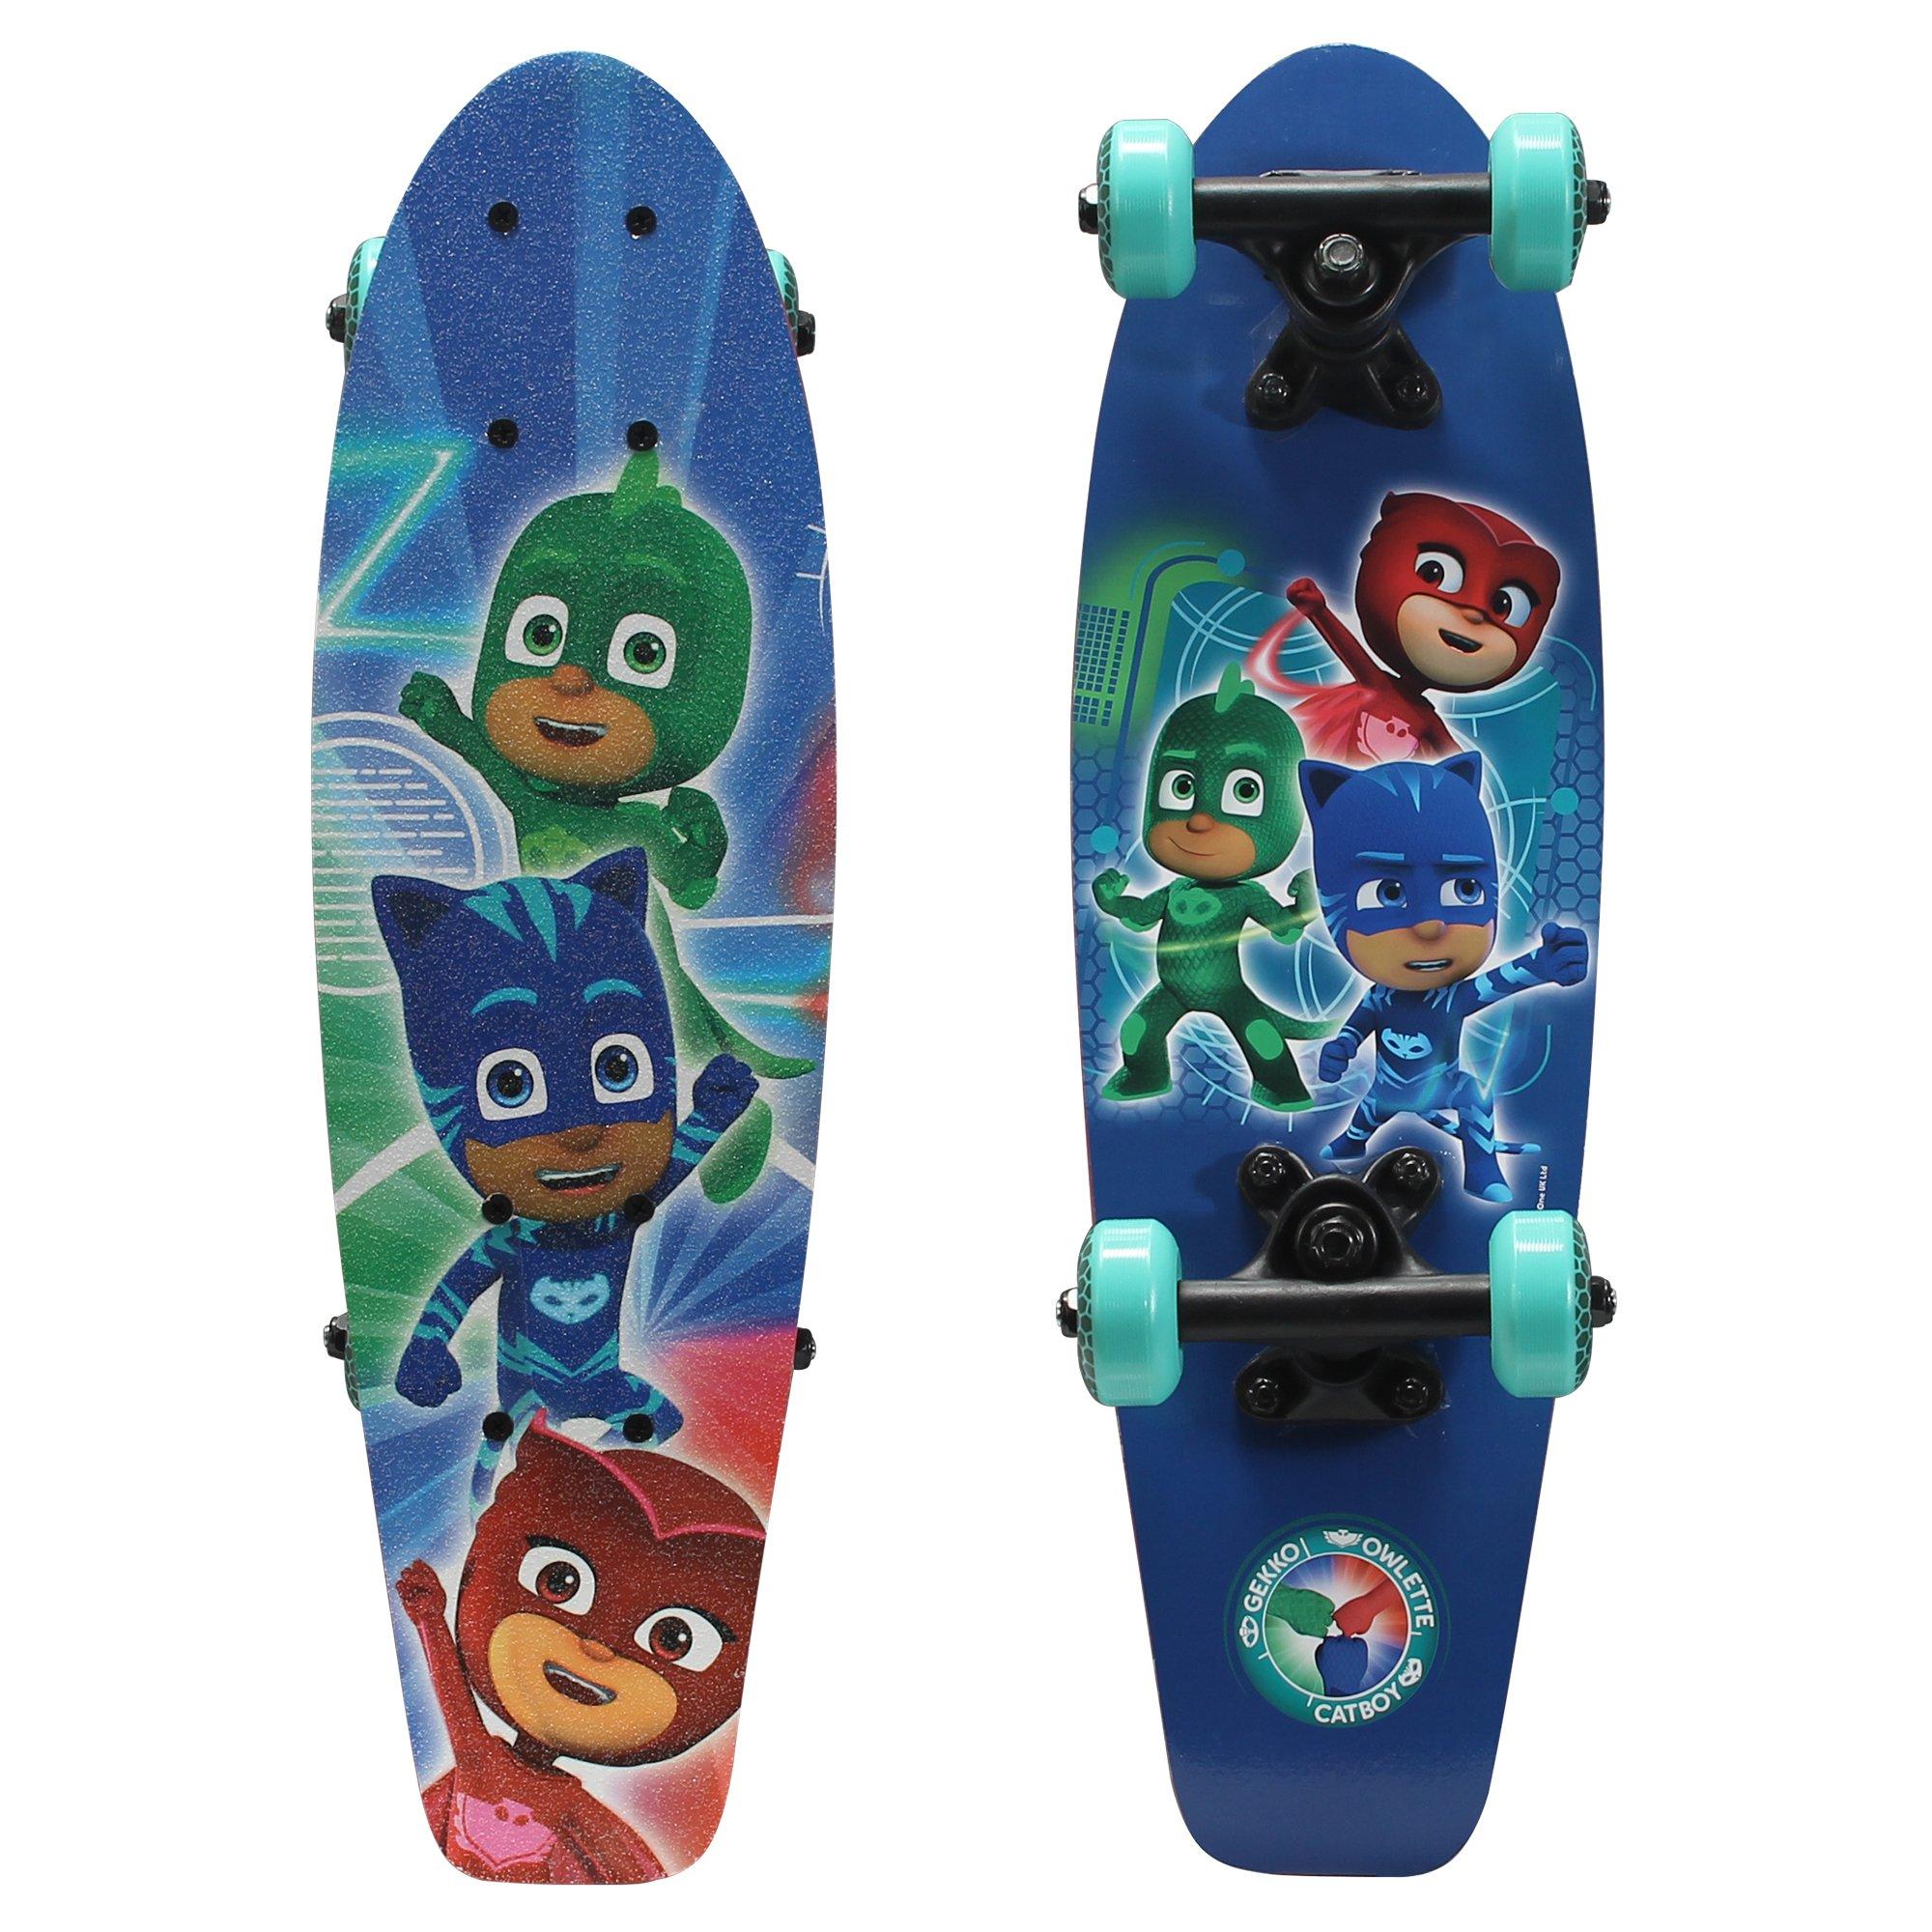 PlayWheels PJ Masks 21'' Wood Cruiser Skateboard, Power